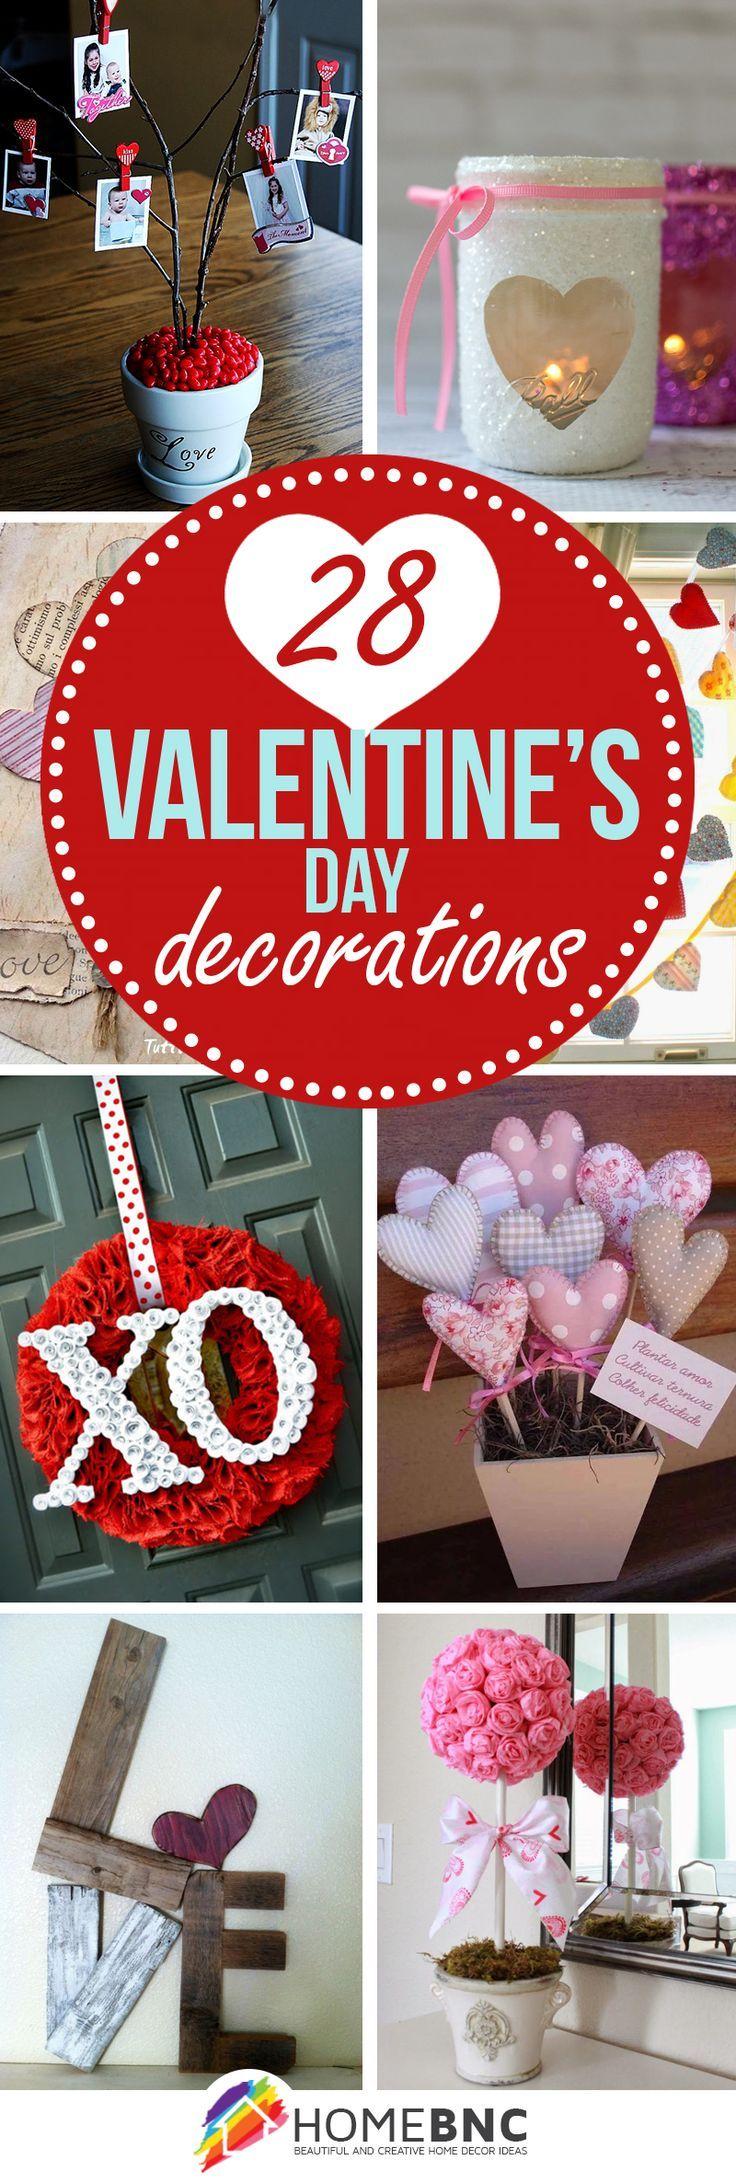 28 Super Creative Valentineu0027s Day Decor Ideas To Inspire Romance